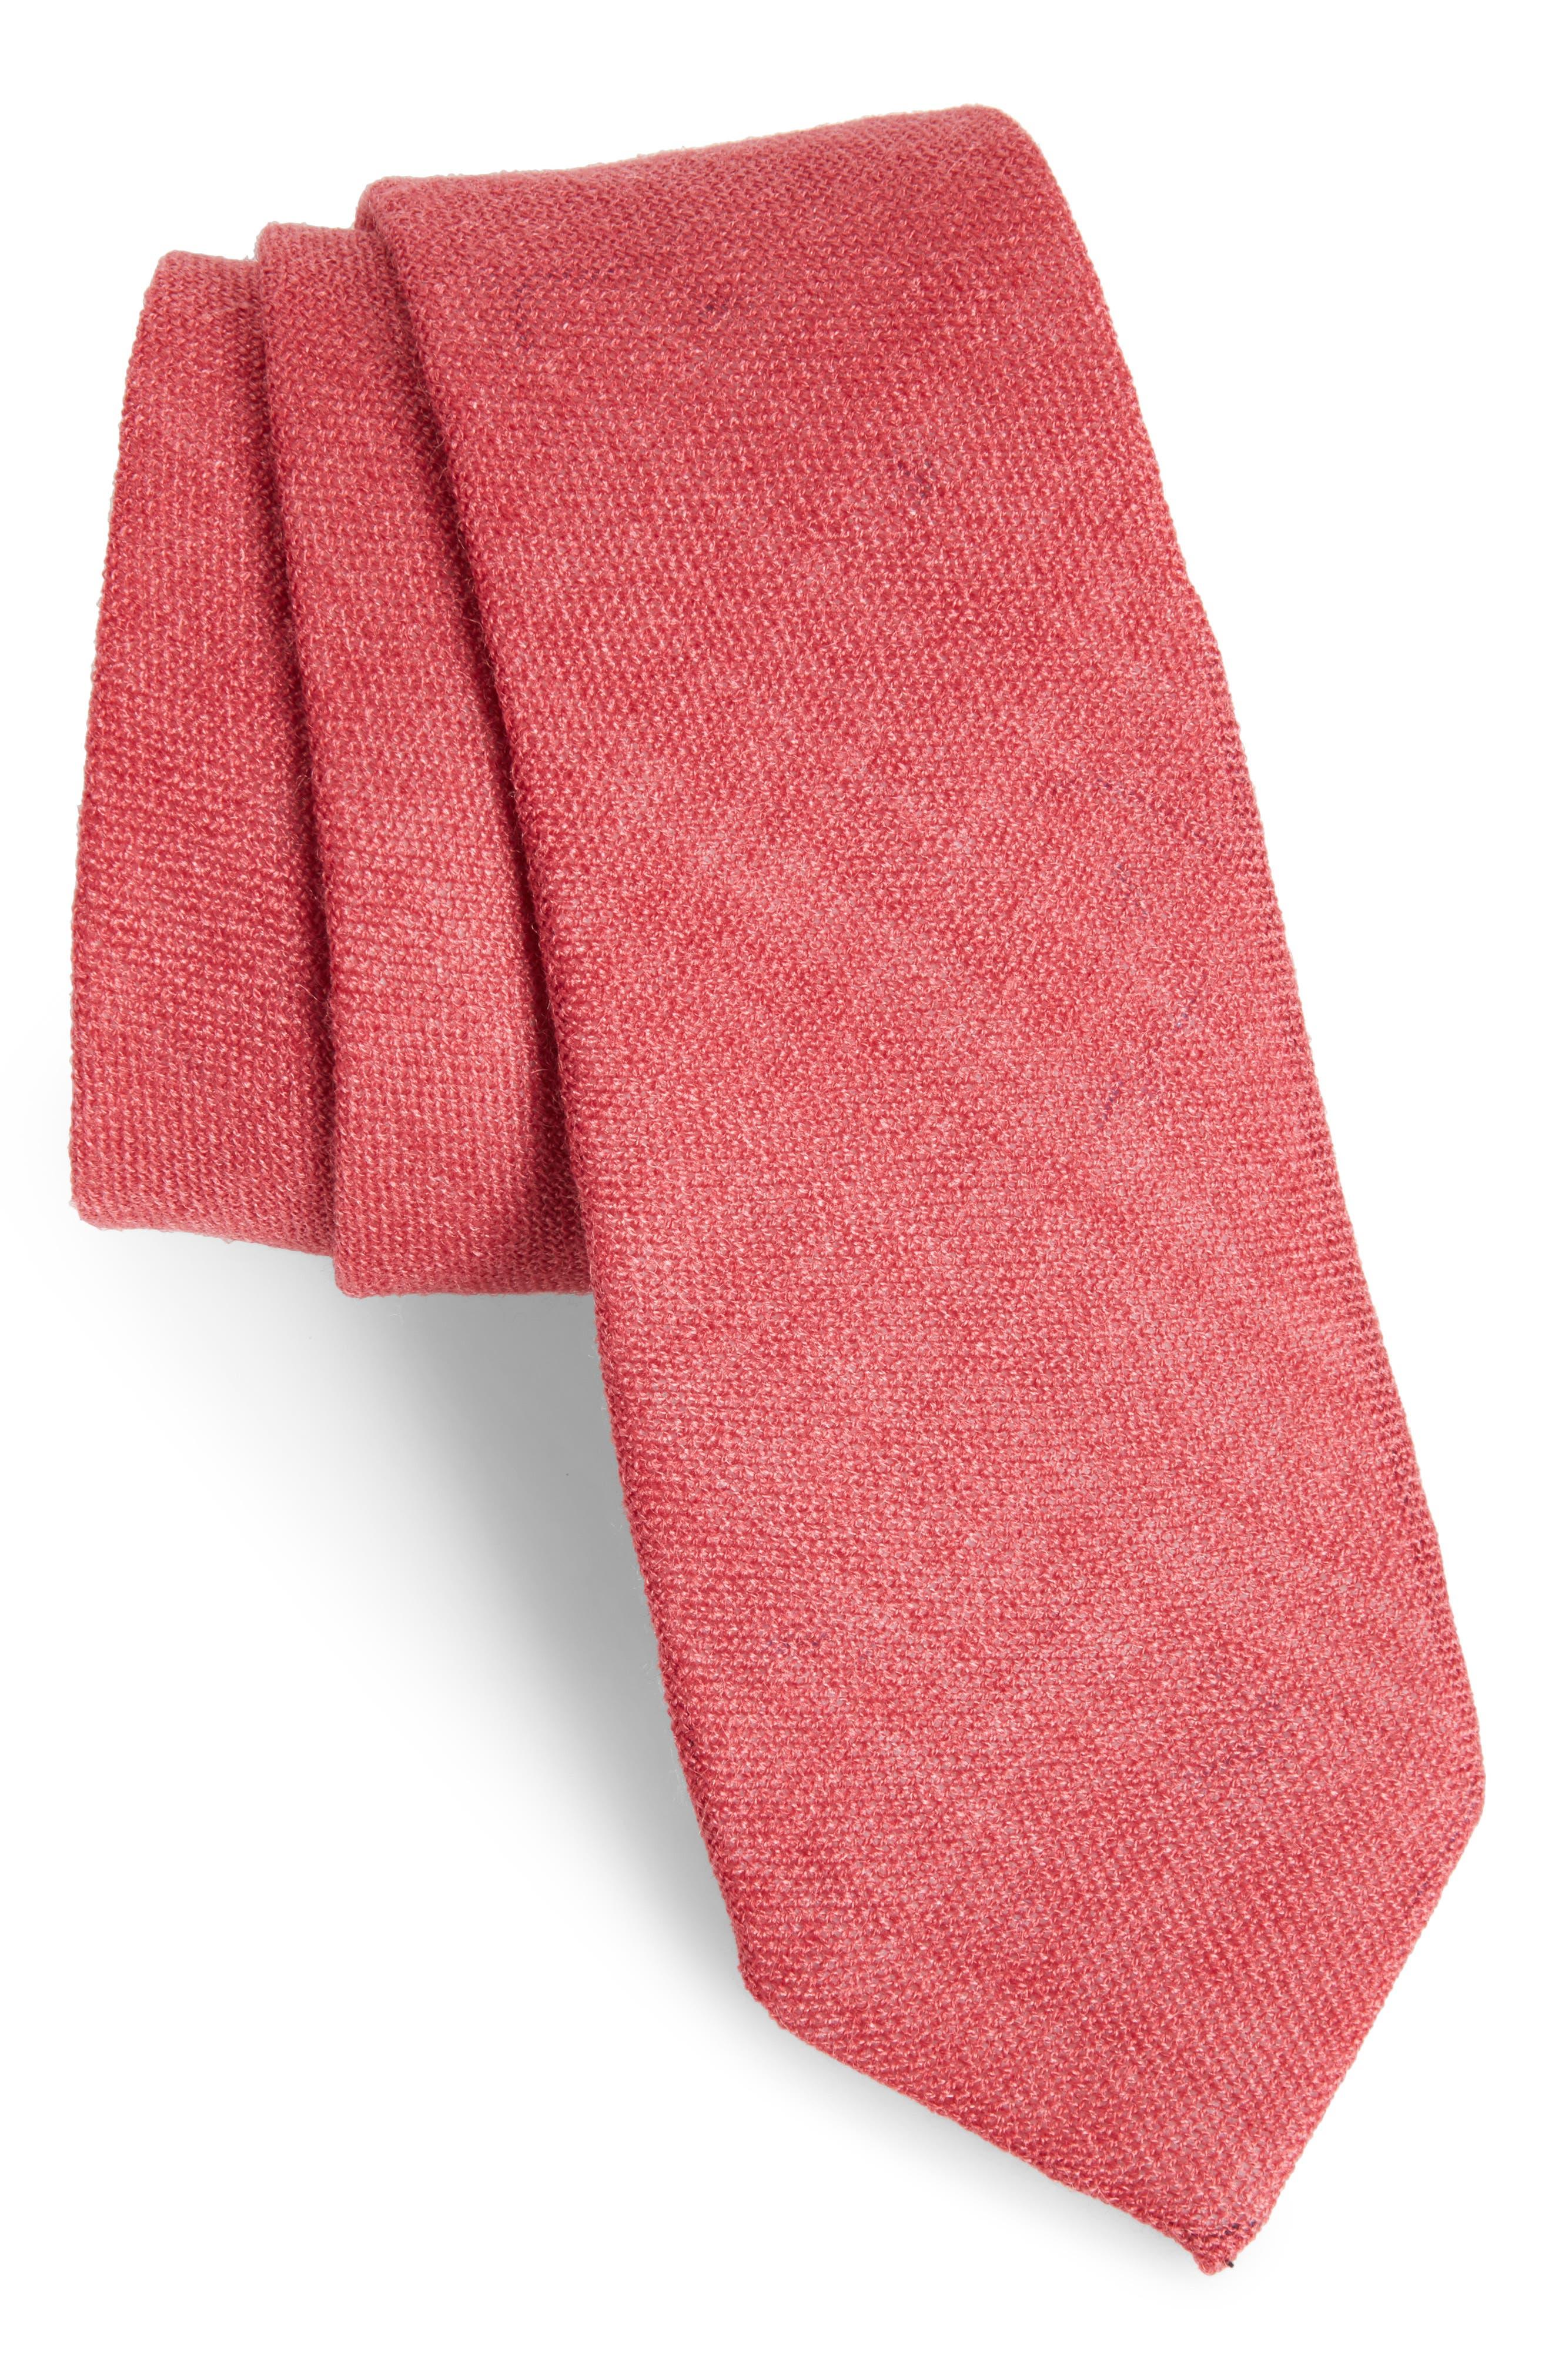 Bradford Solid Cotton Skinny Tie,                         Main,                         color, Red